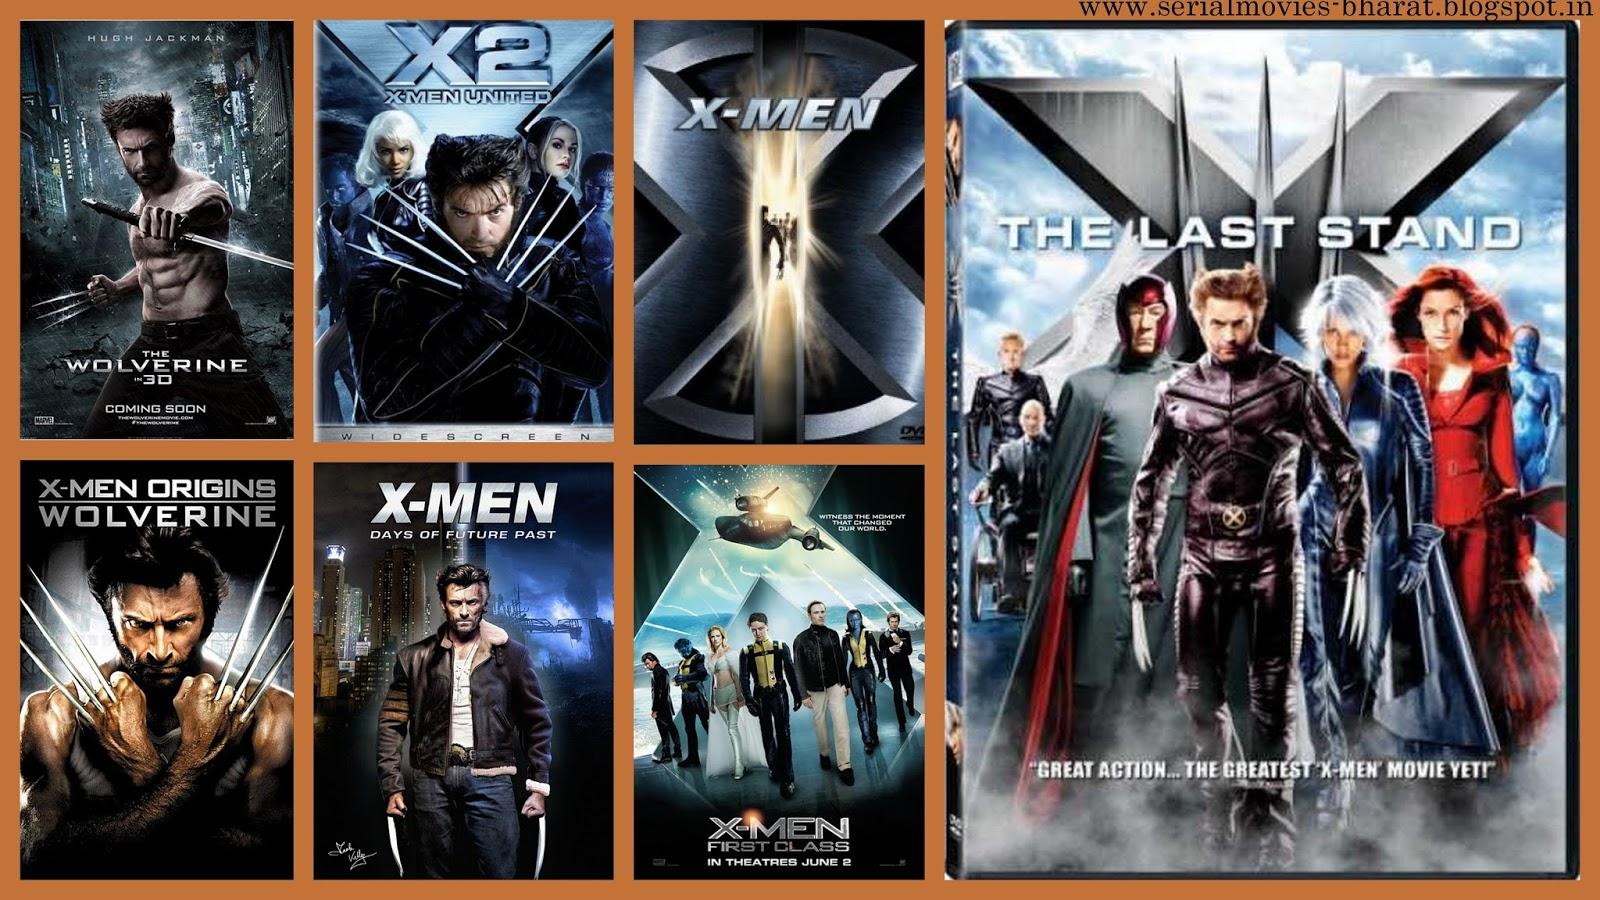 jual dvd xmen movie collection movie play tokopedia